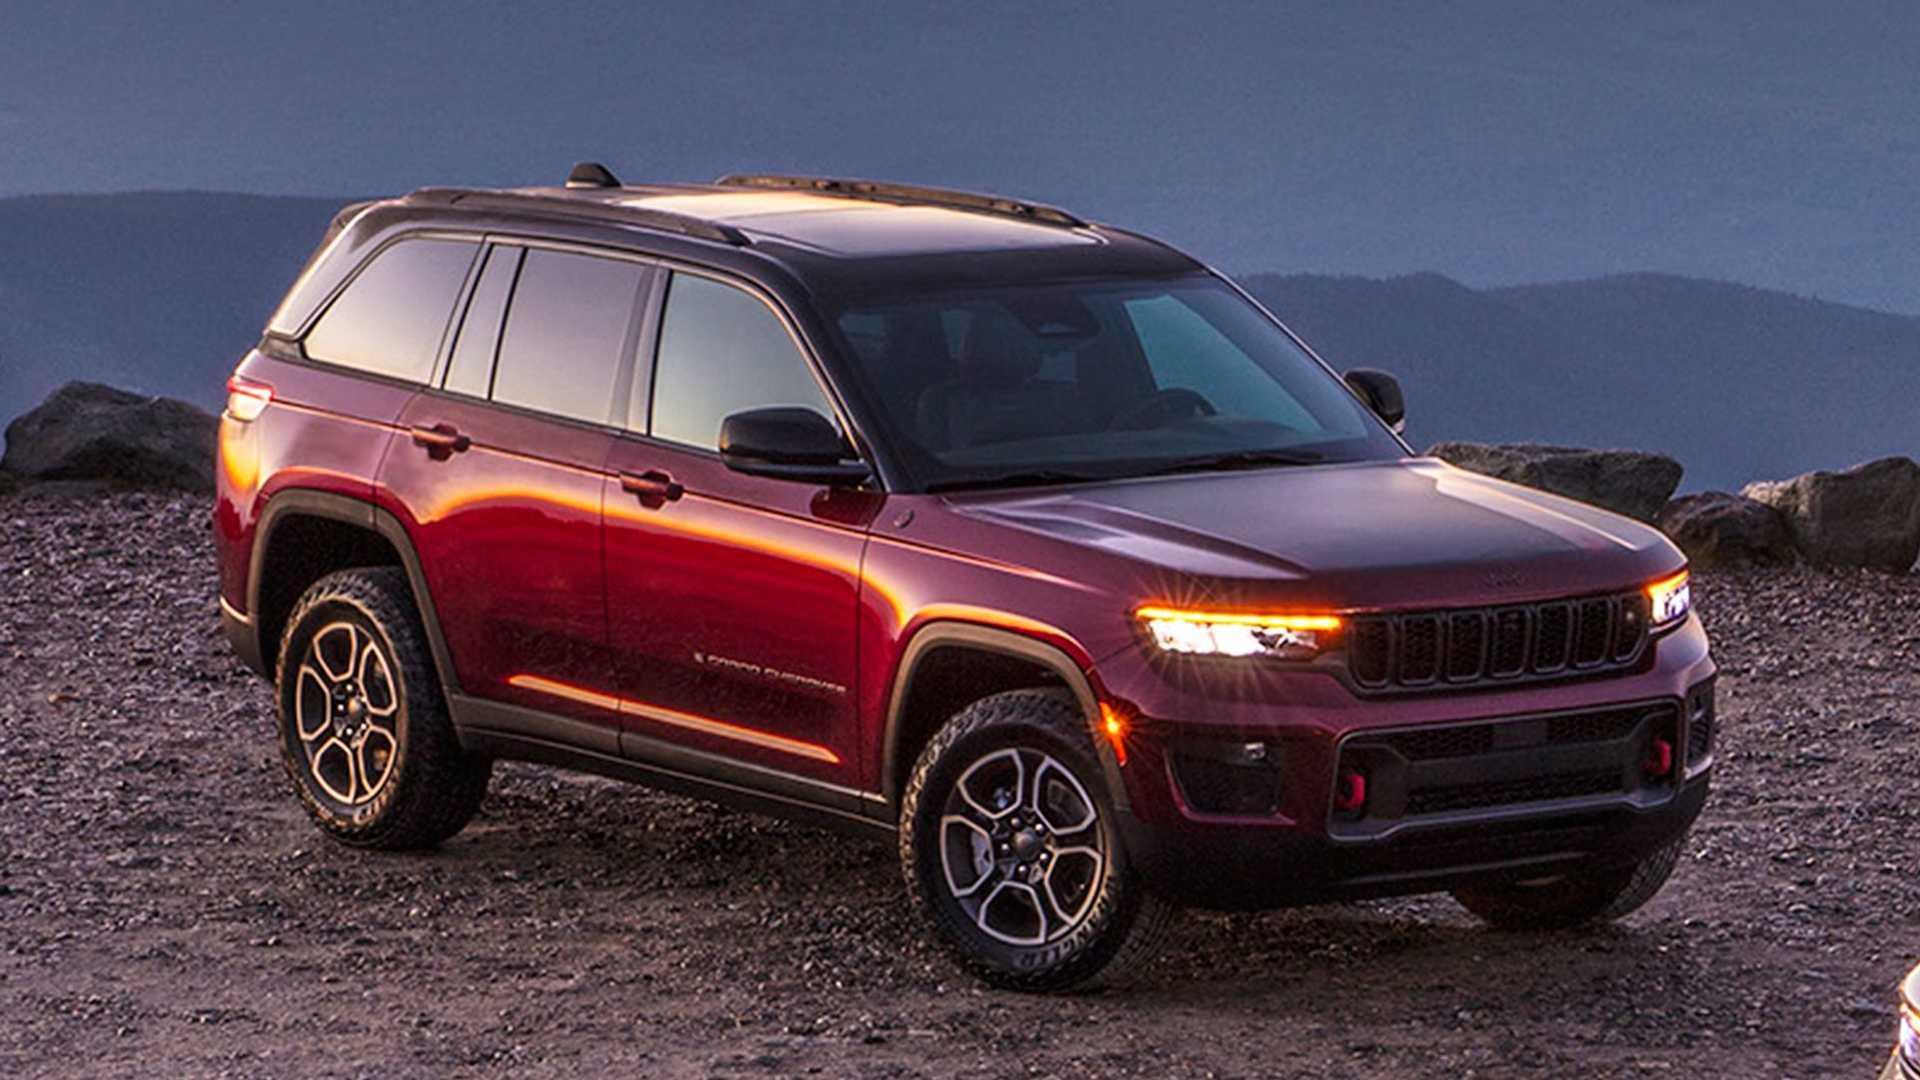 https://cdn.motor1.com/images/mgl/l90rN/s6/2022-jeep-grand-cherokee.jpg